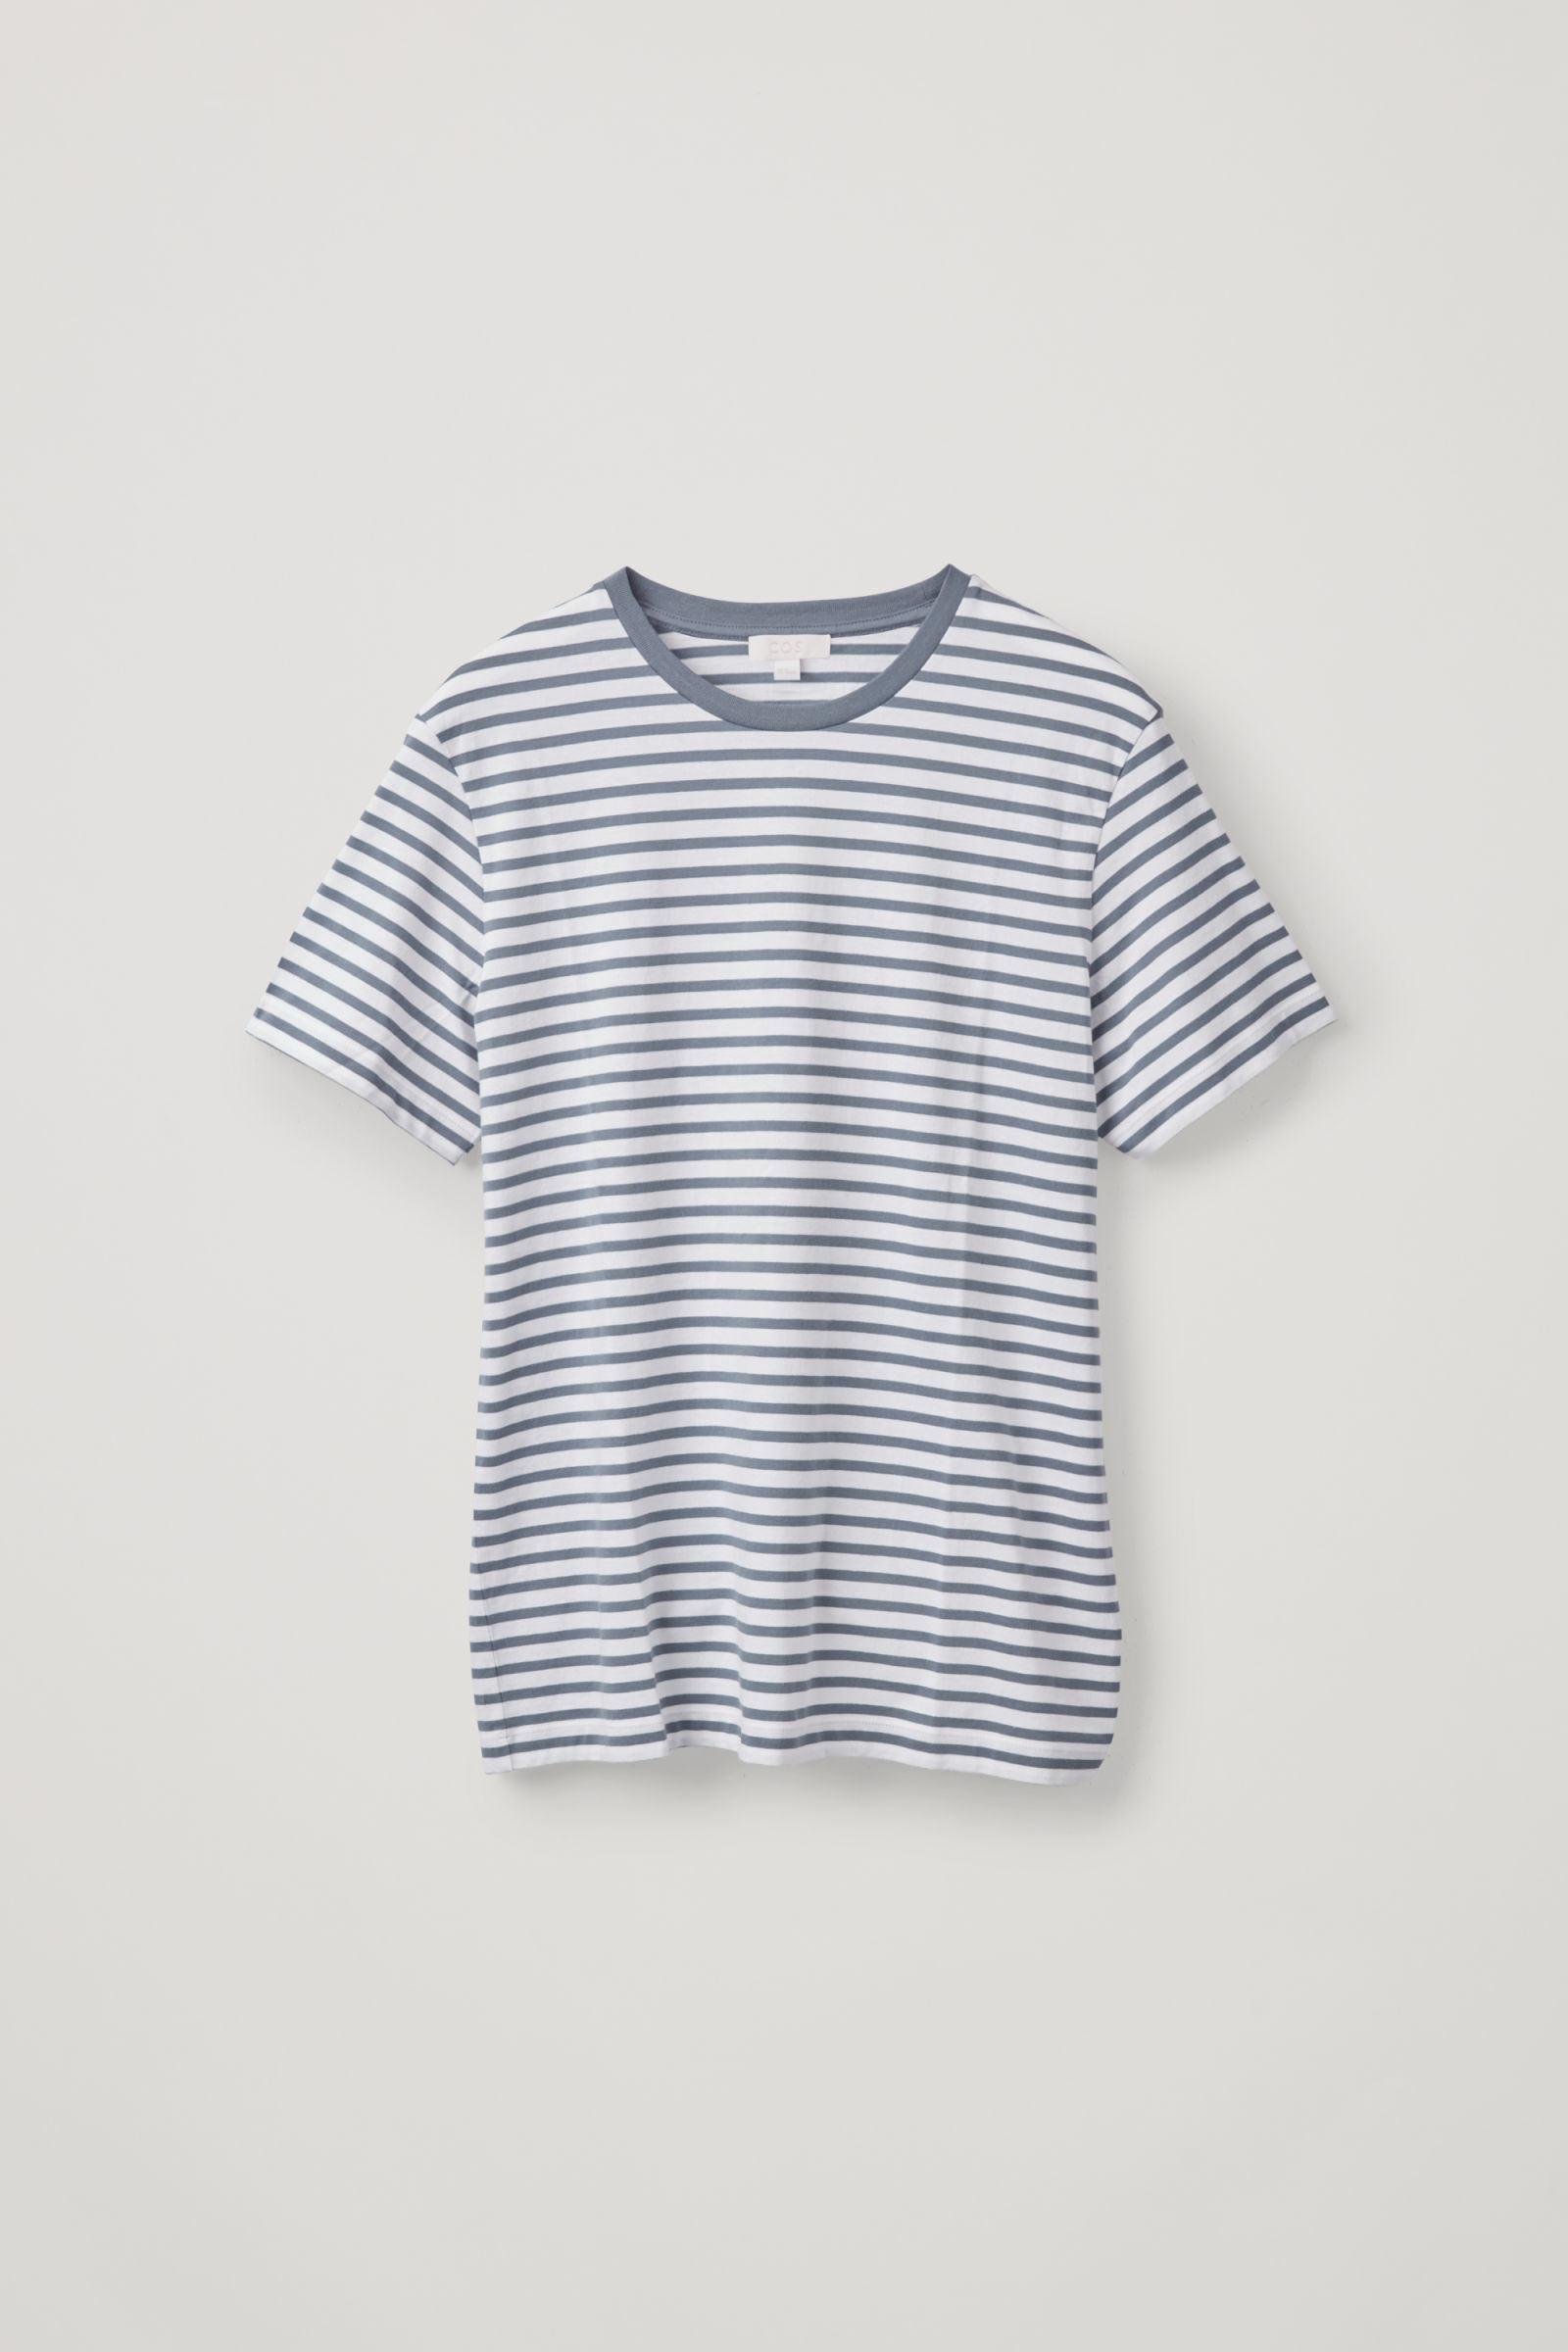 COS 브레톤 스트라이프 저지 티셔츠의 화이트 / 스톤워시 블루컬러 상품컷입니다.